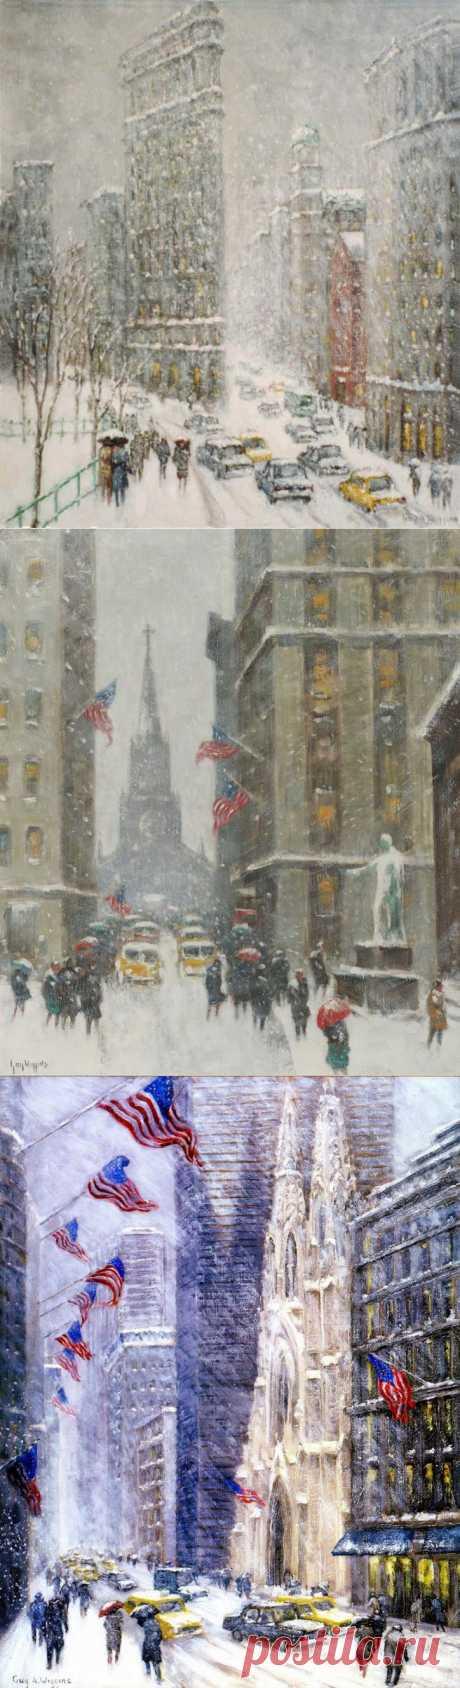 Зимний город. Гай Карлтон Виггинс / Guy Carleton Wiggins (1883 – 1962).